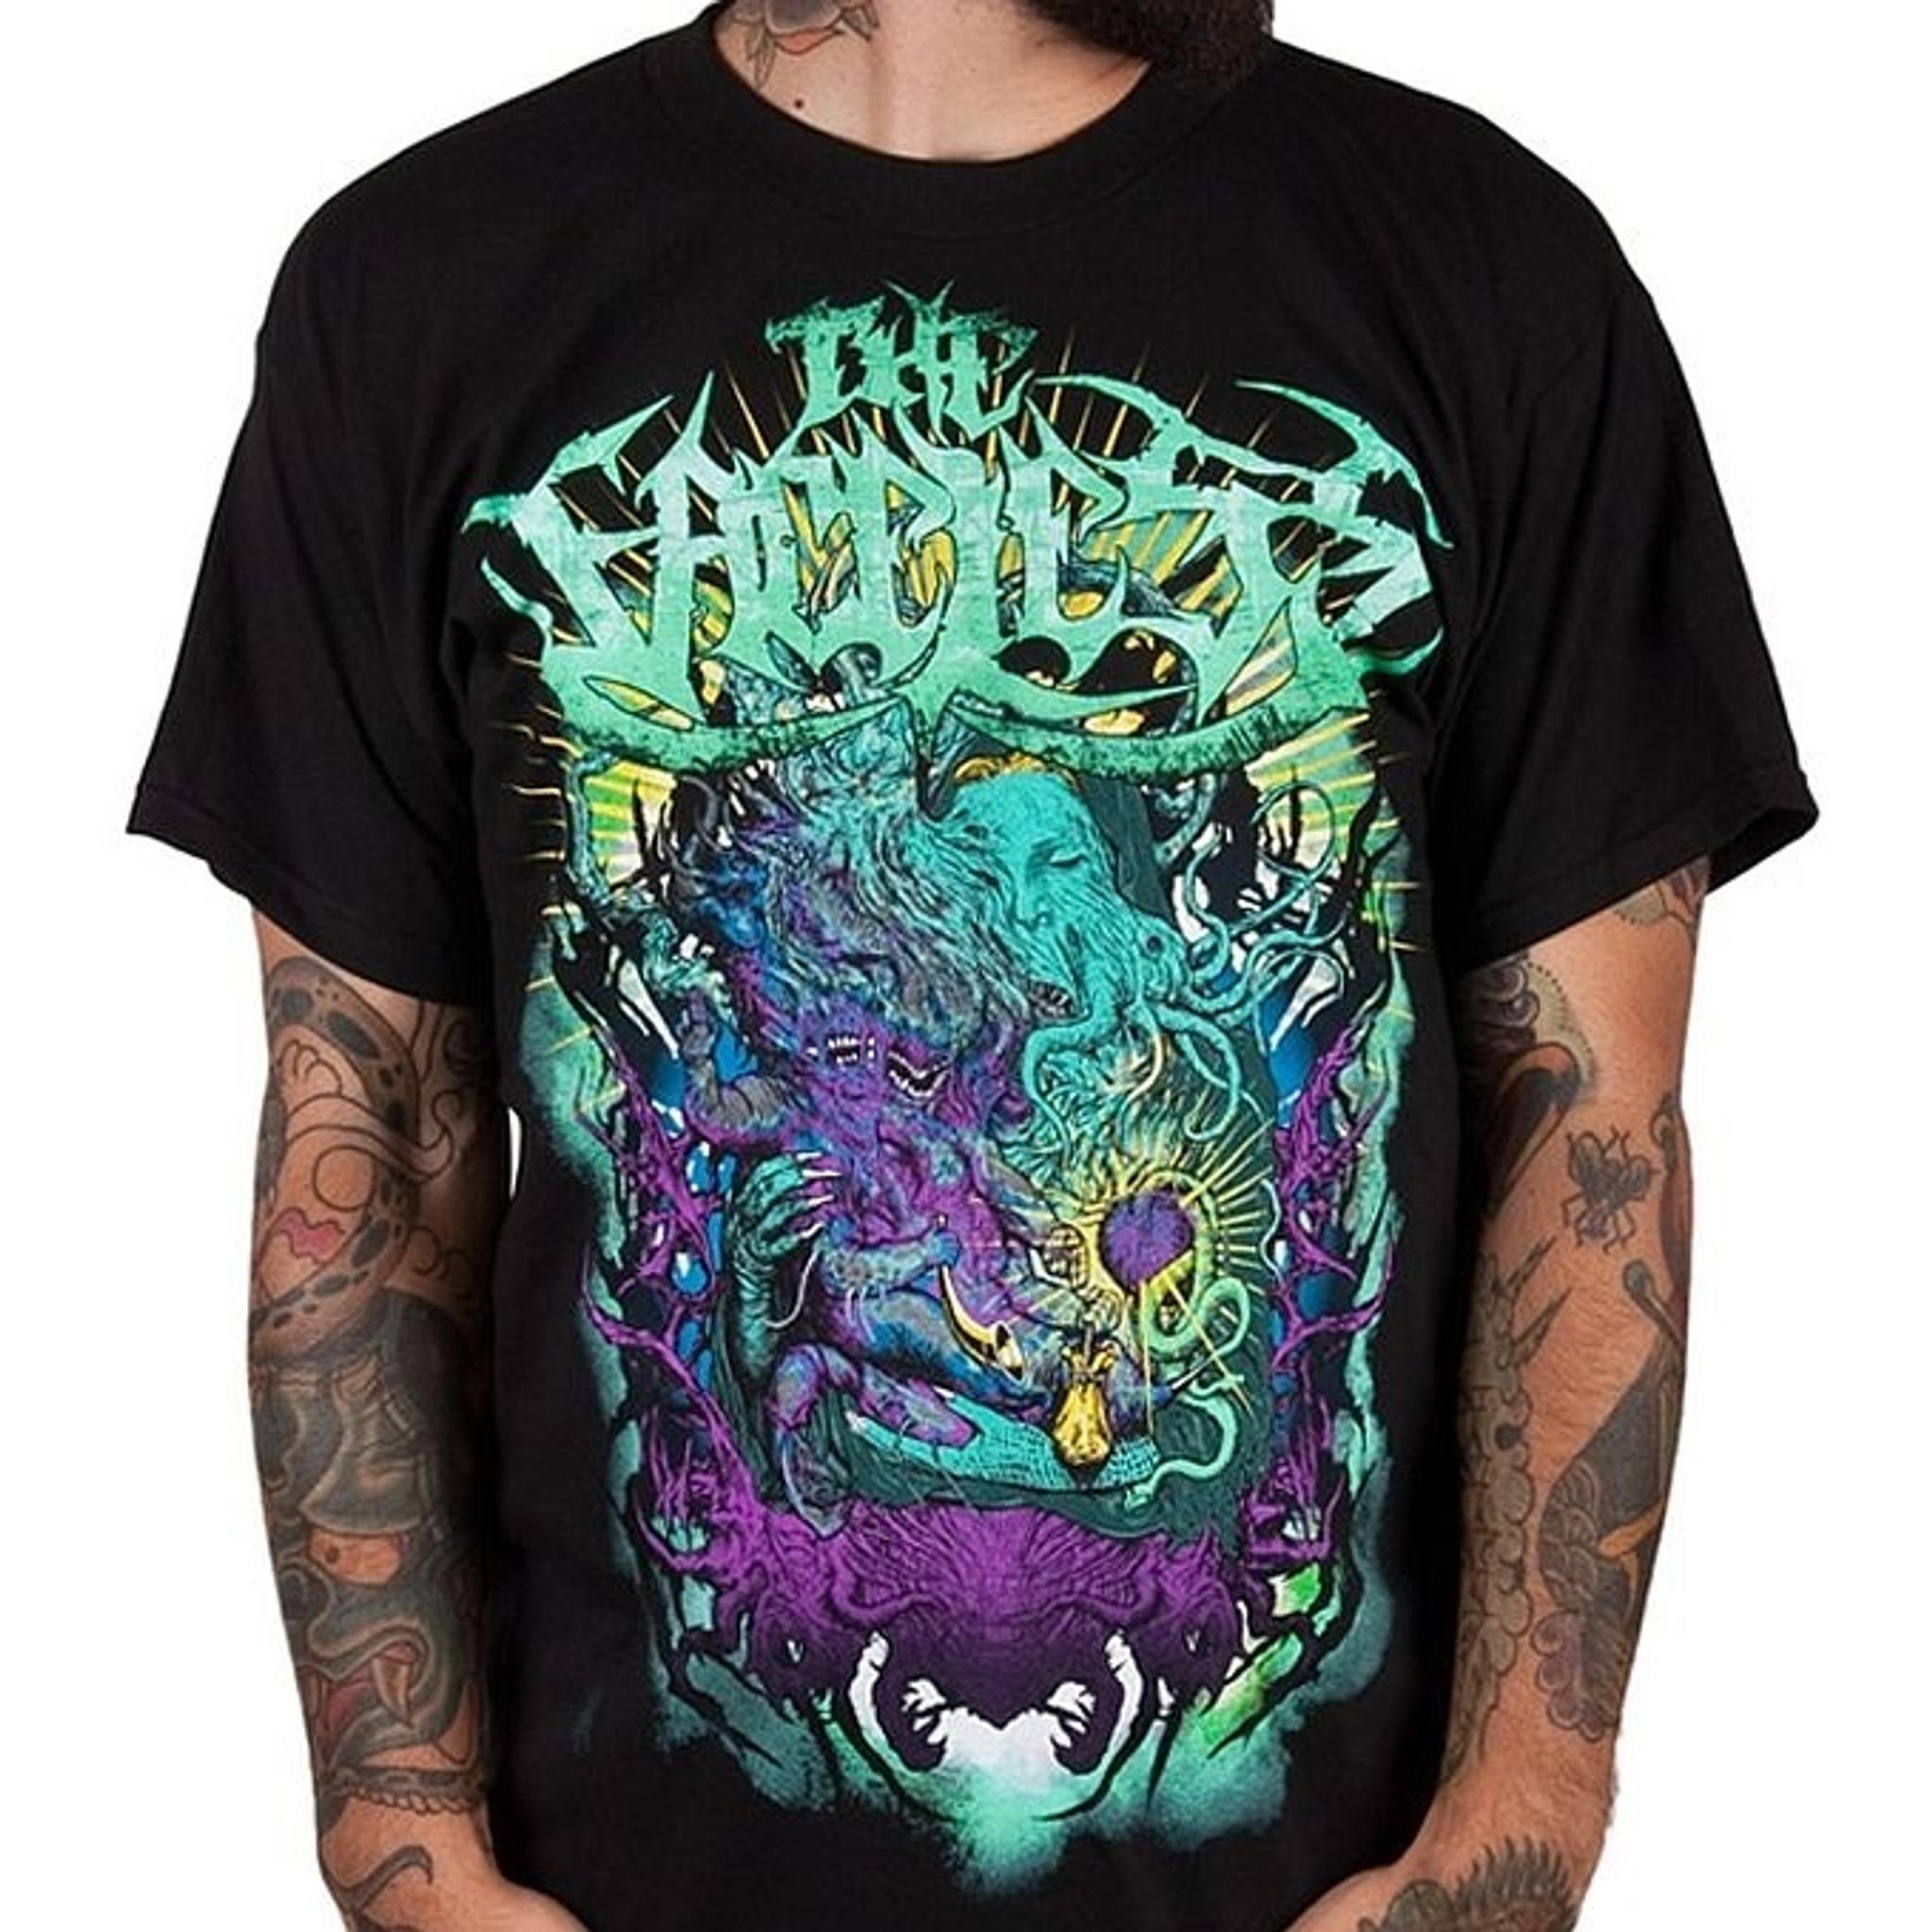 Faceless Prophet Of Contamination T Shirt [ 2048 x 2048 Pixel ]